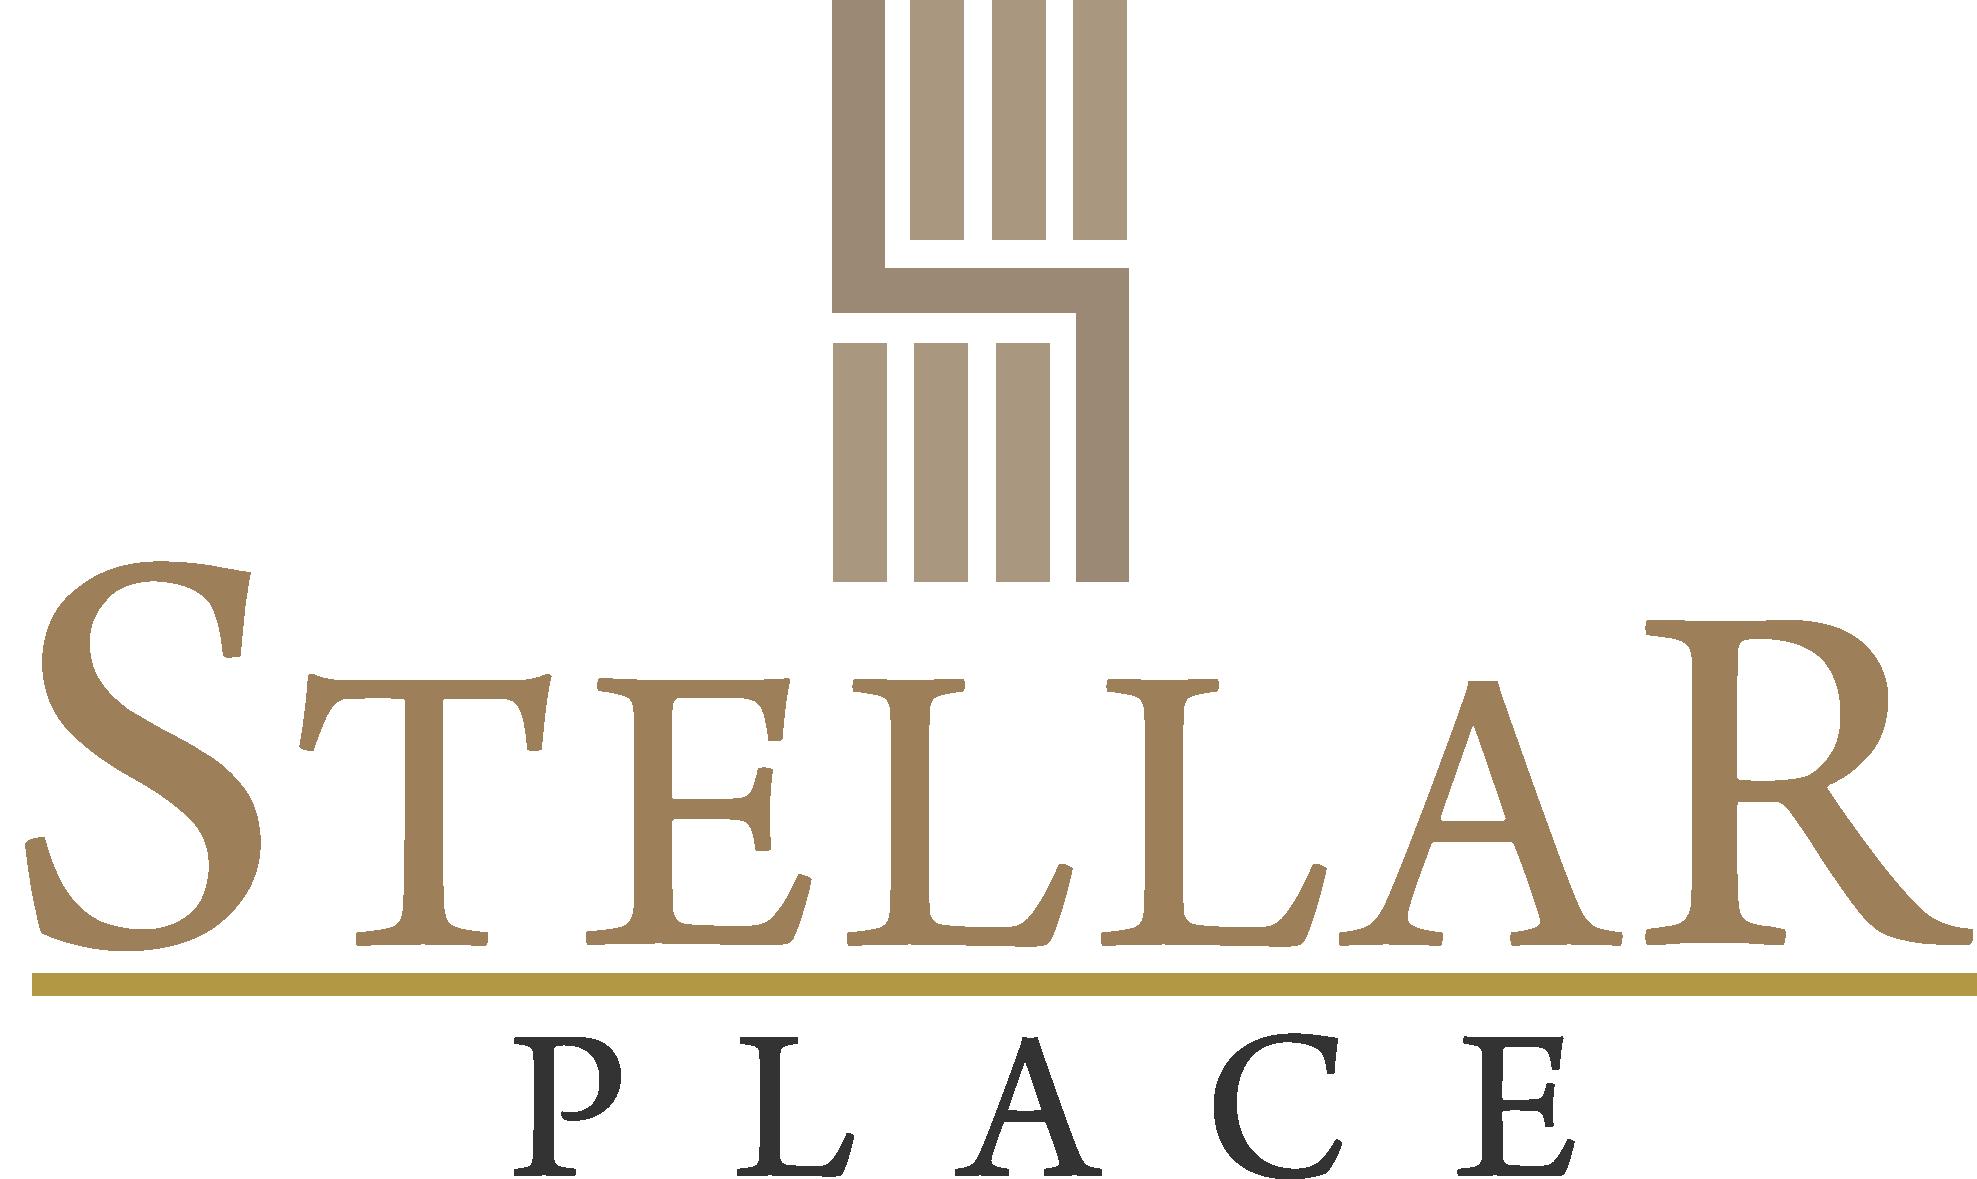 Stellar Place property logo